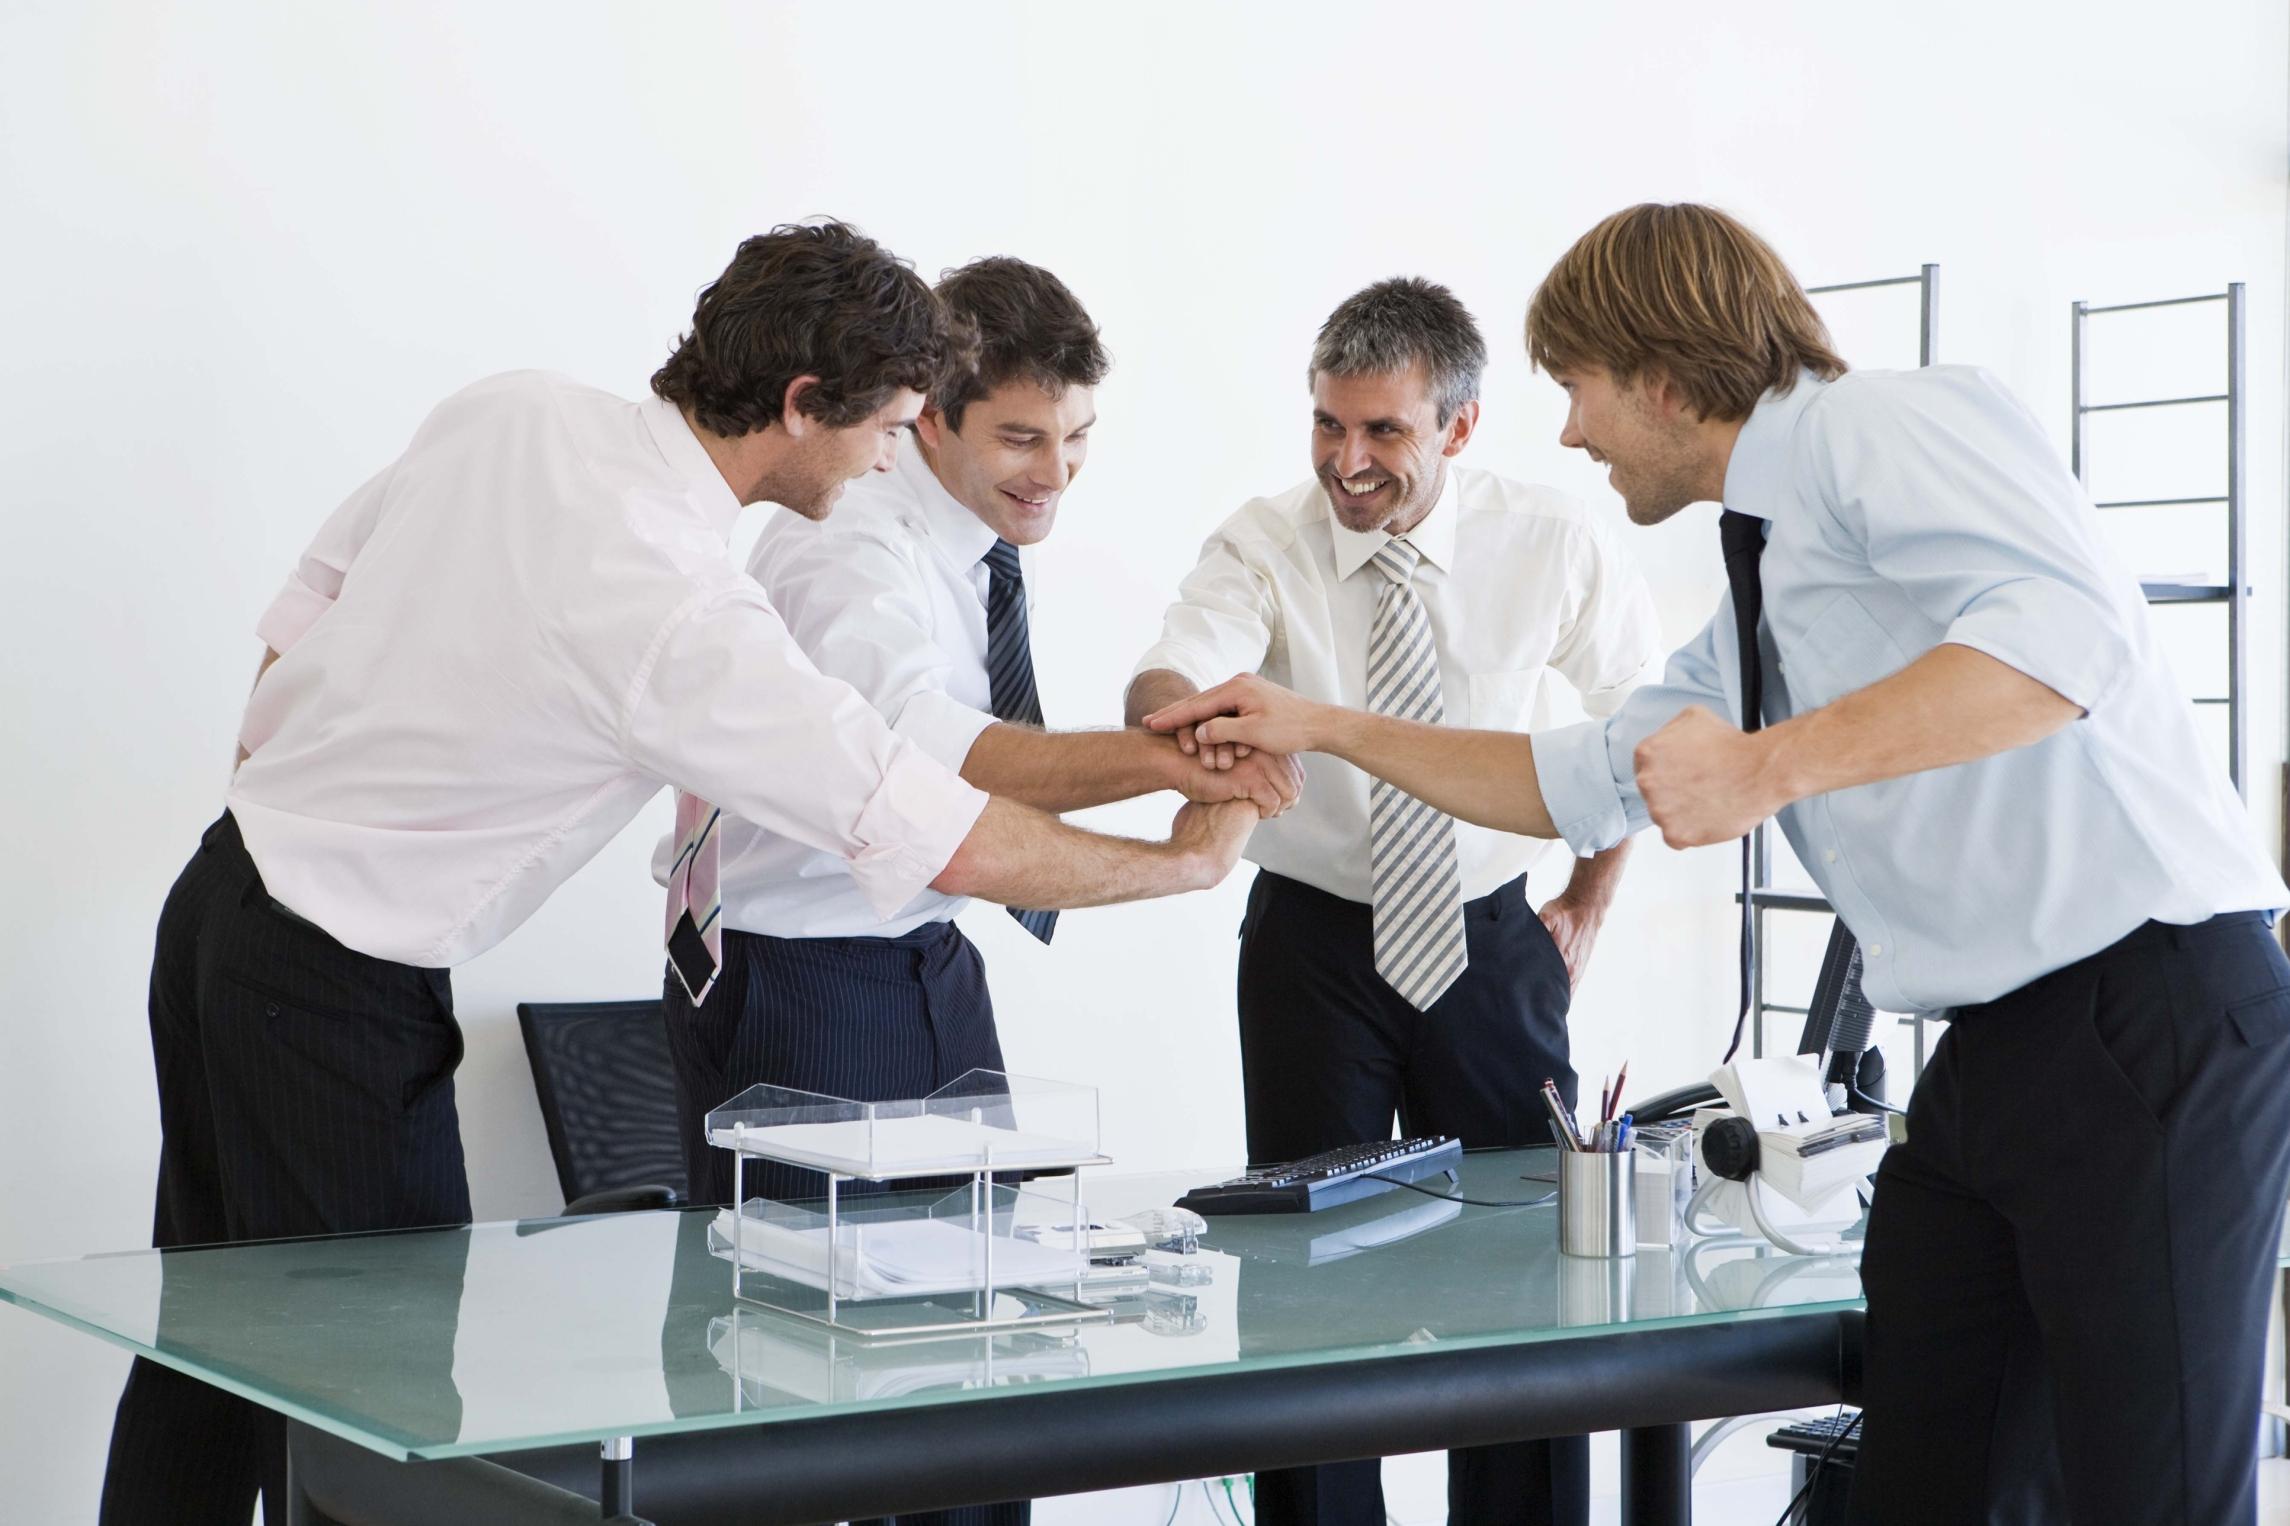 Fun Sales Contest Ideas for Work | Chron com